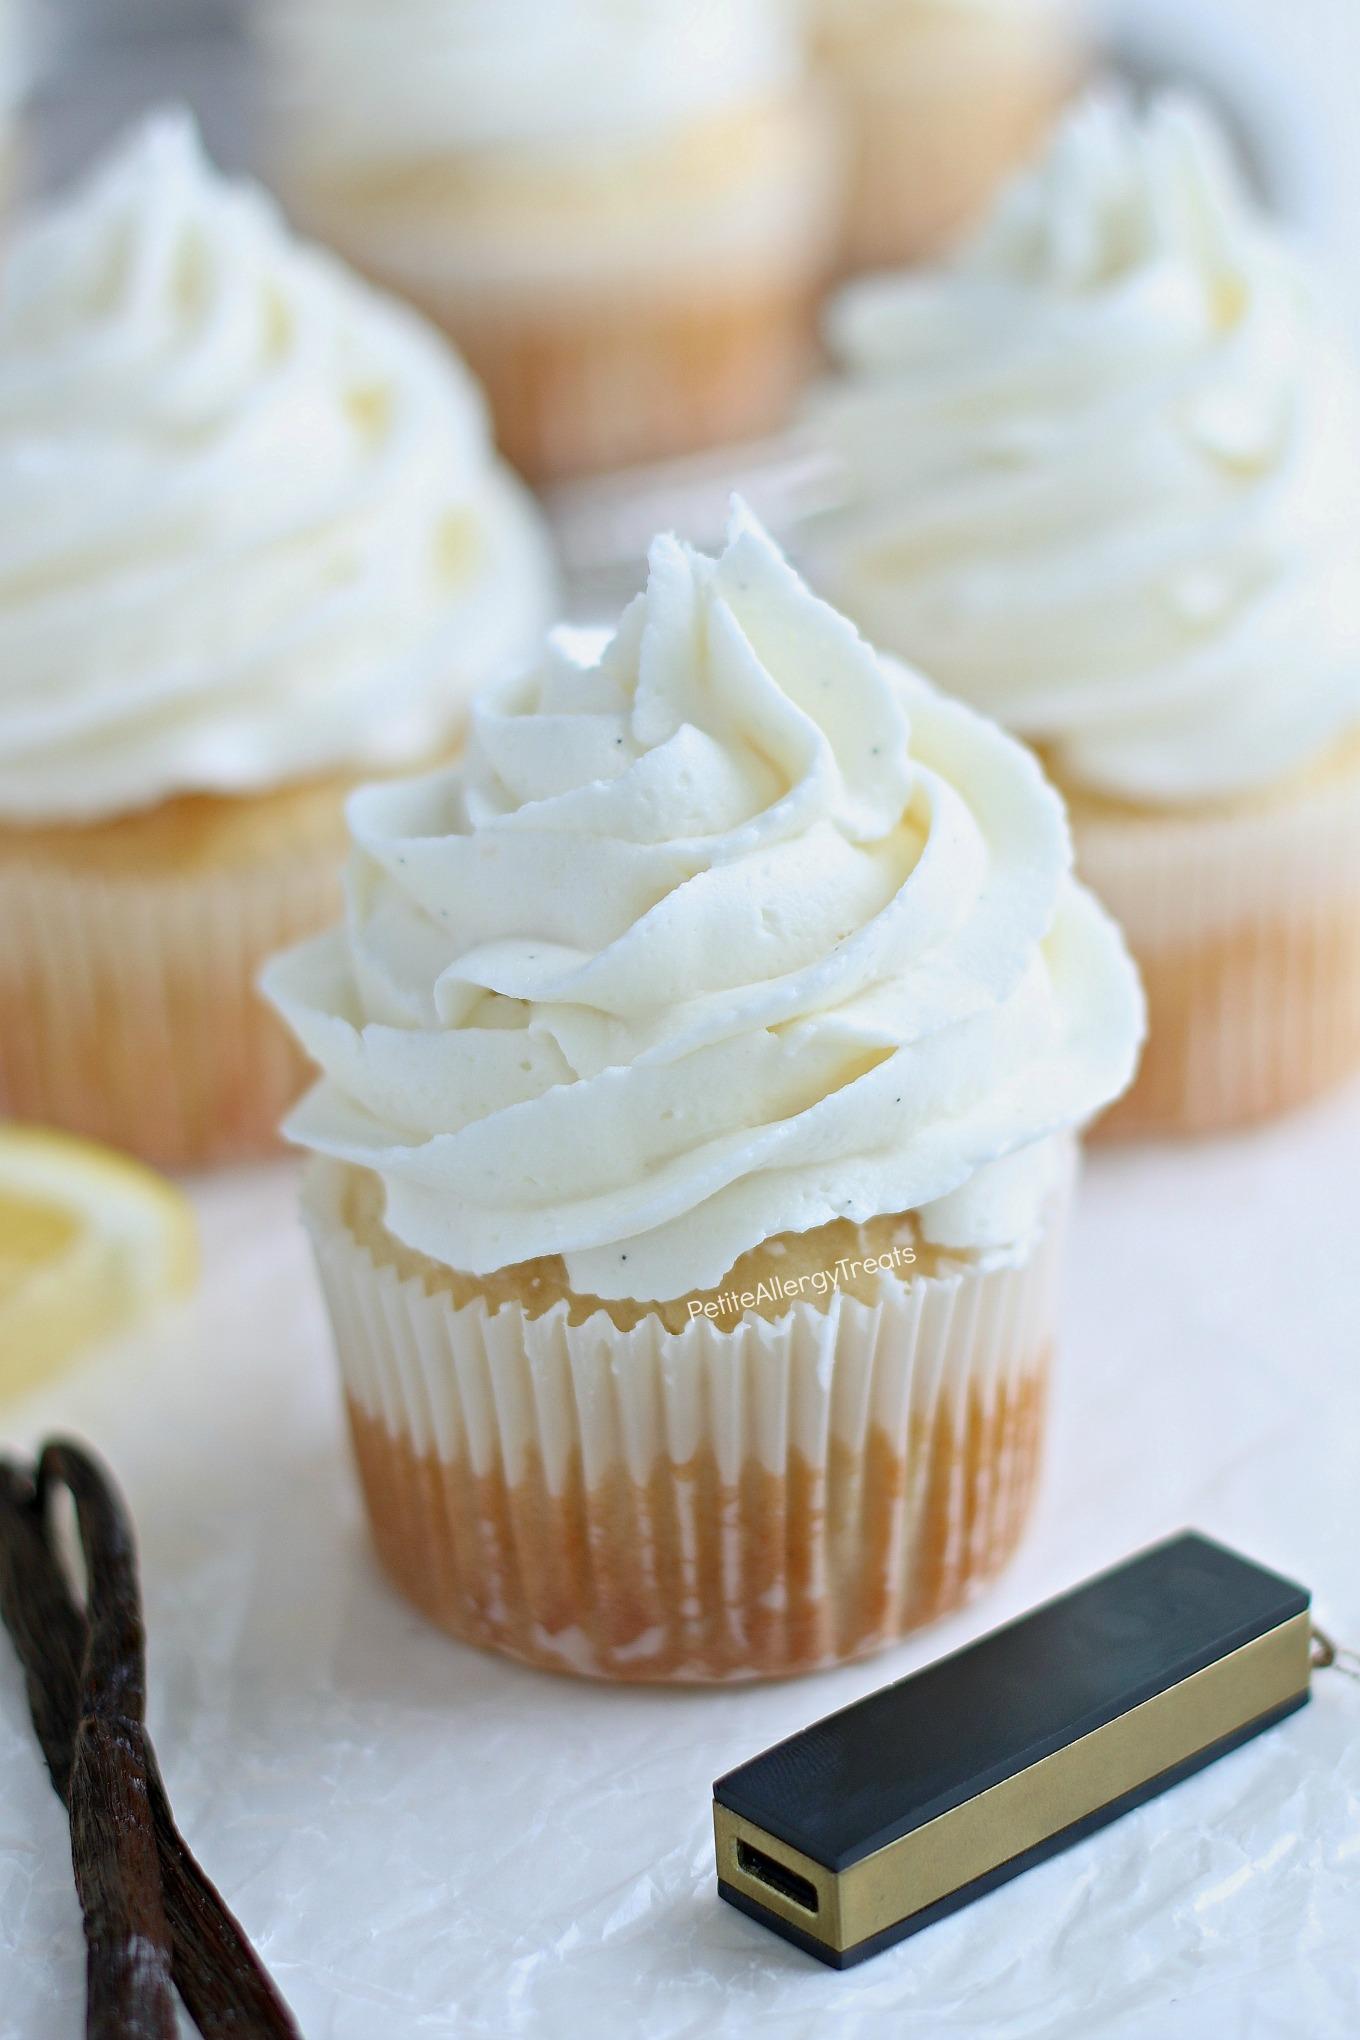 Dairy Free Gluten Free Vanilla Cupcakes Recipe (vegan egg free)- Bakery style real vanilla bean cupcakes. Food Allergy friendly. Top 8 Free Allergy Amulet.